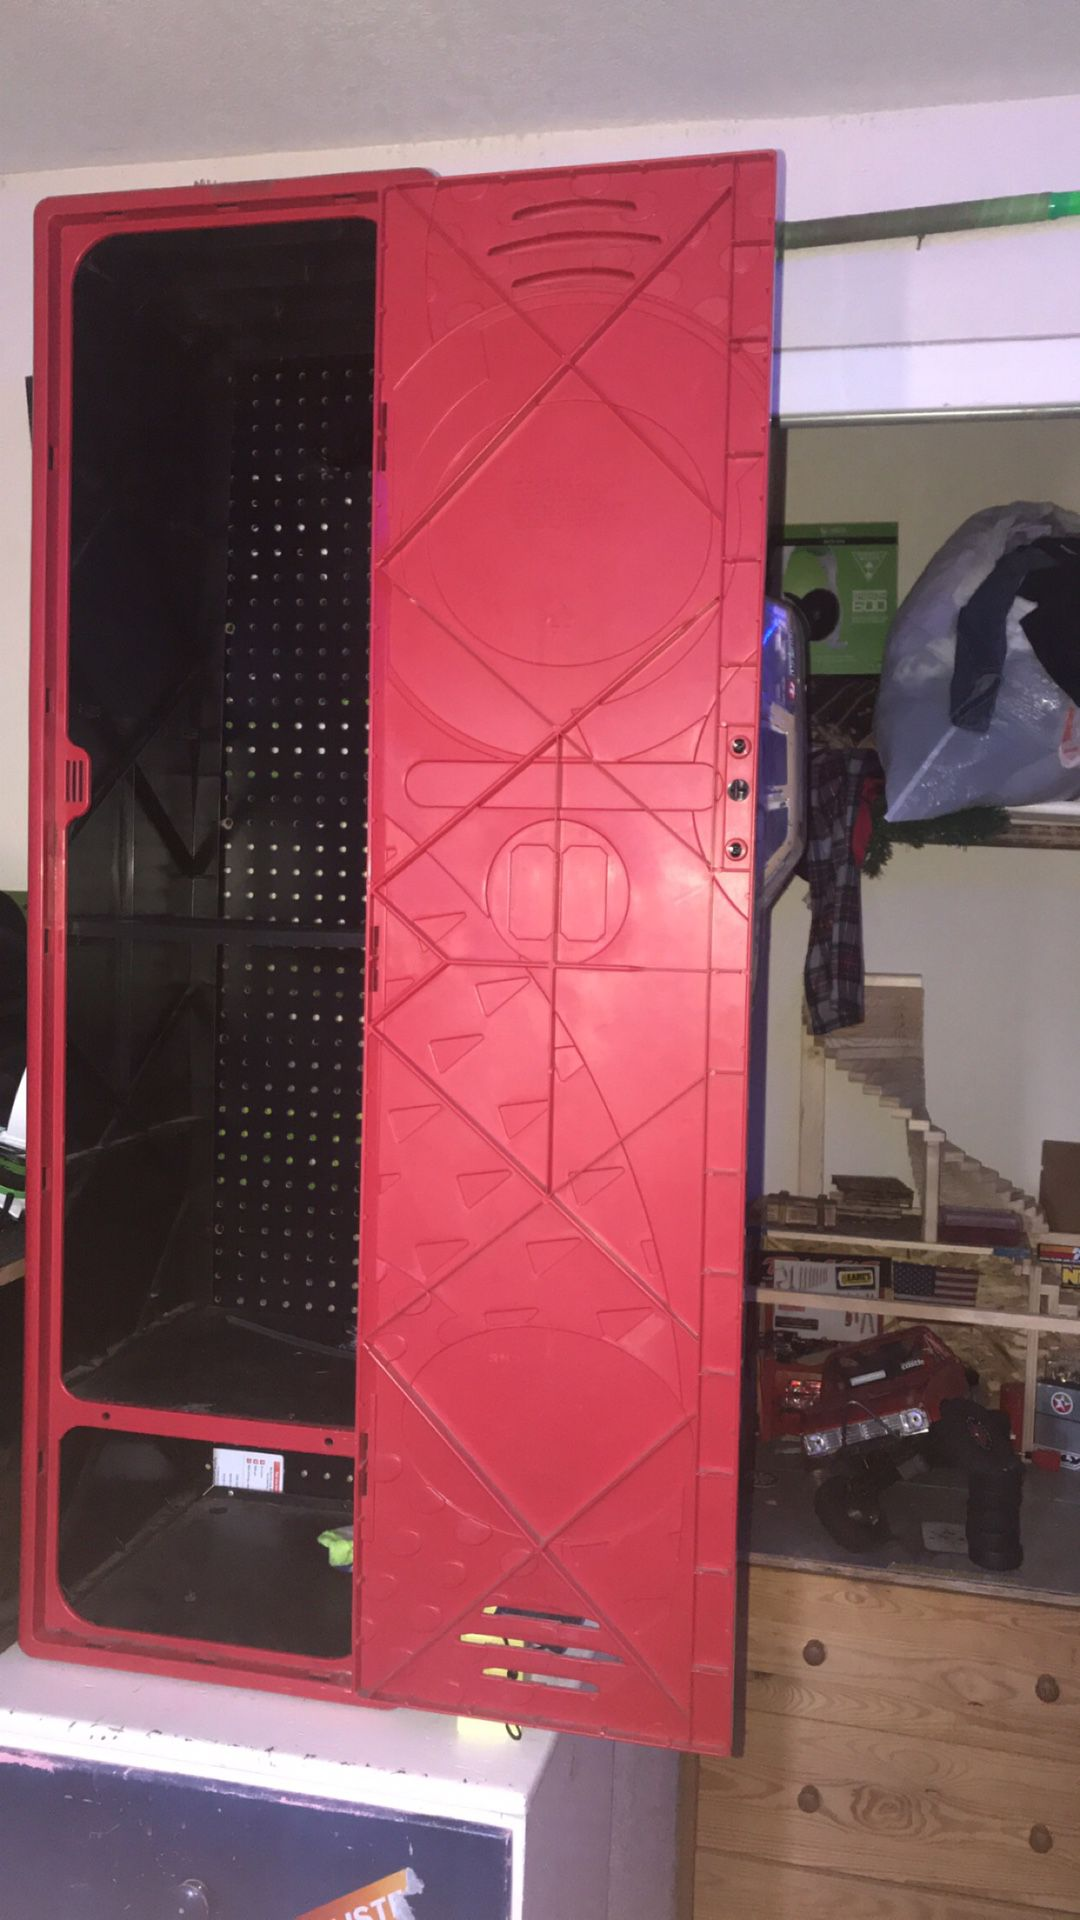 NBA locker for room